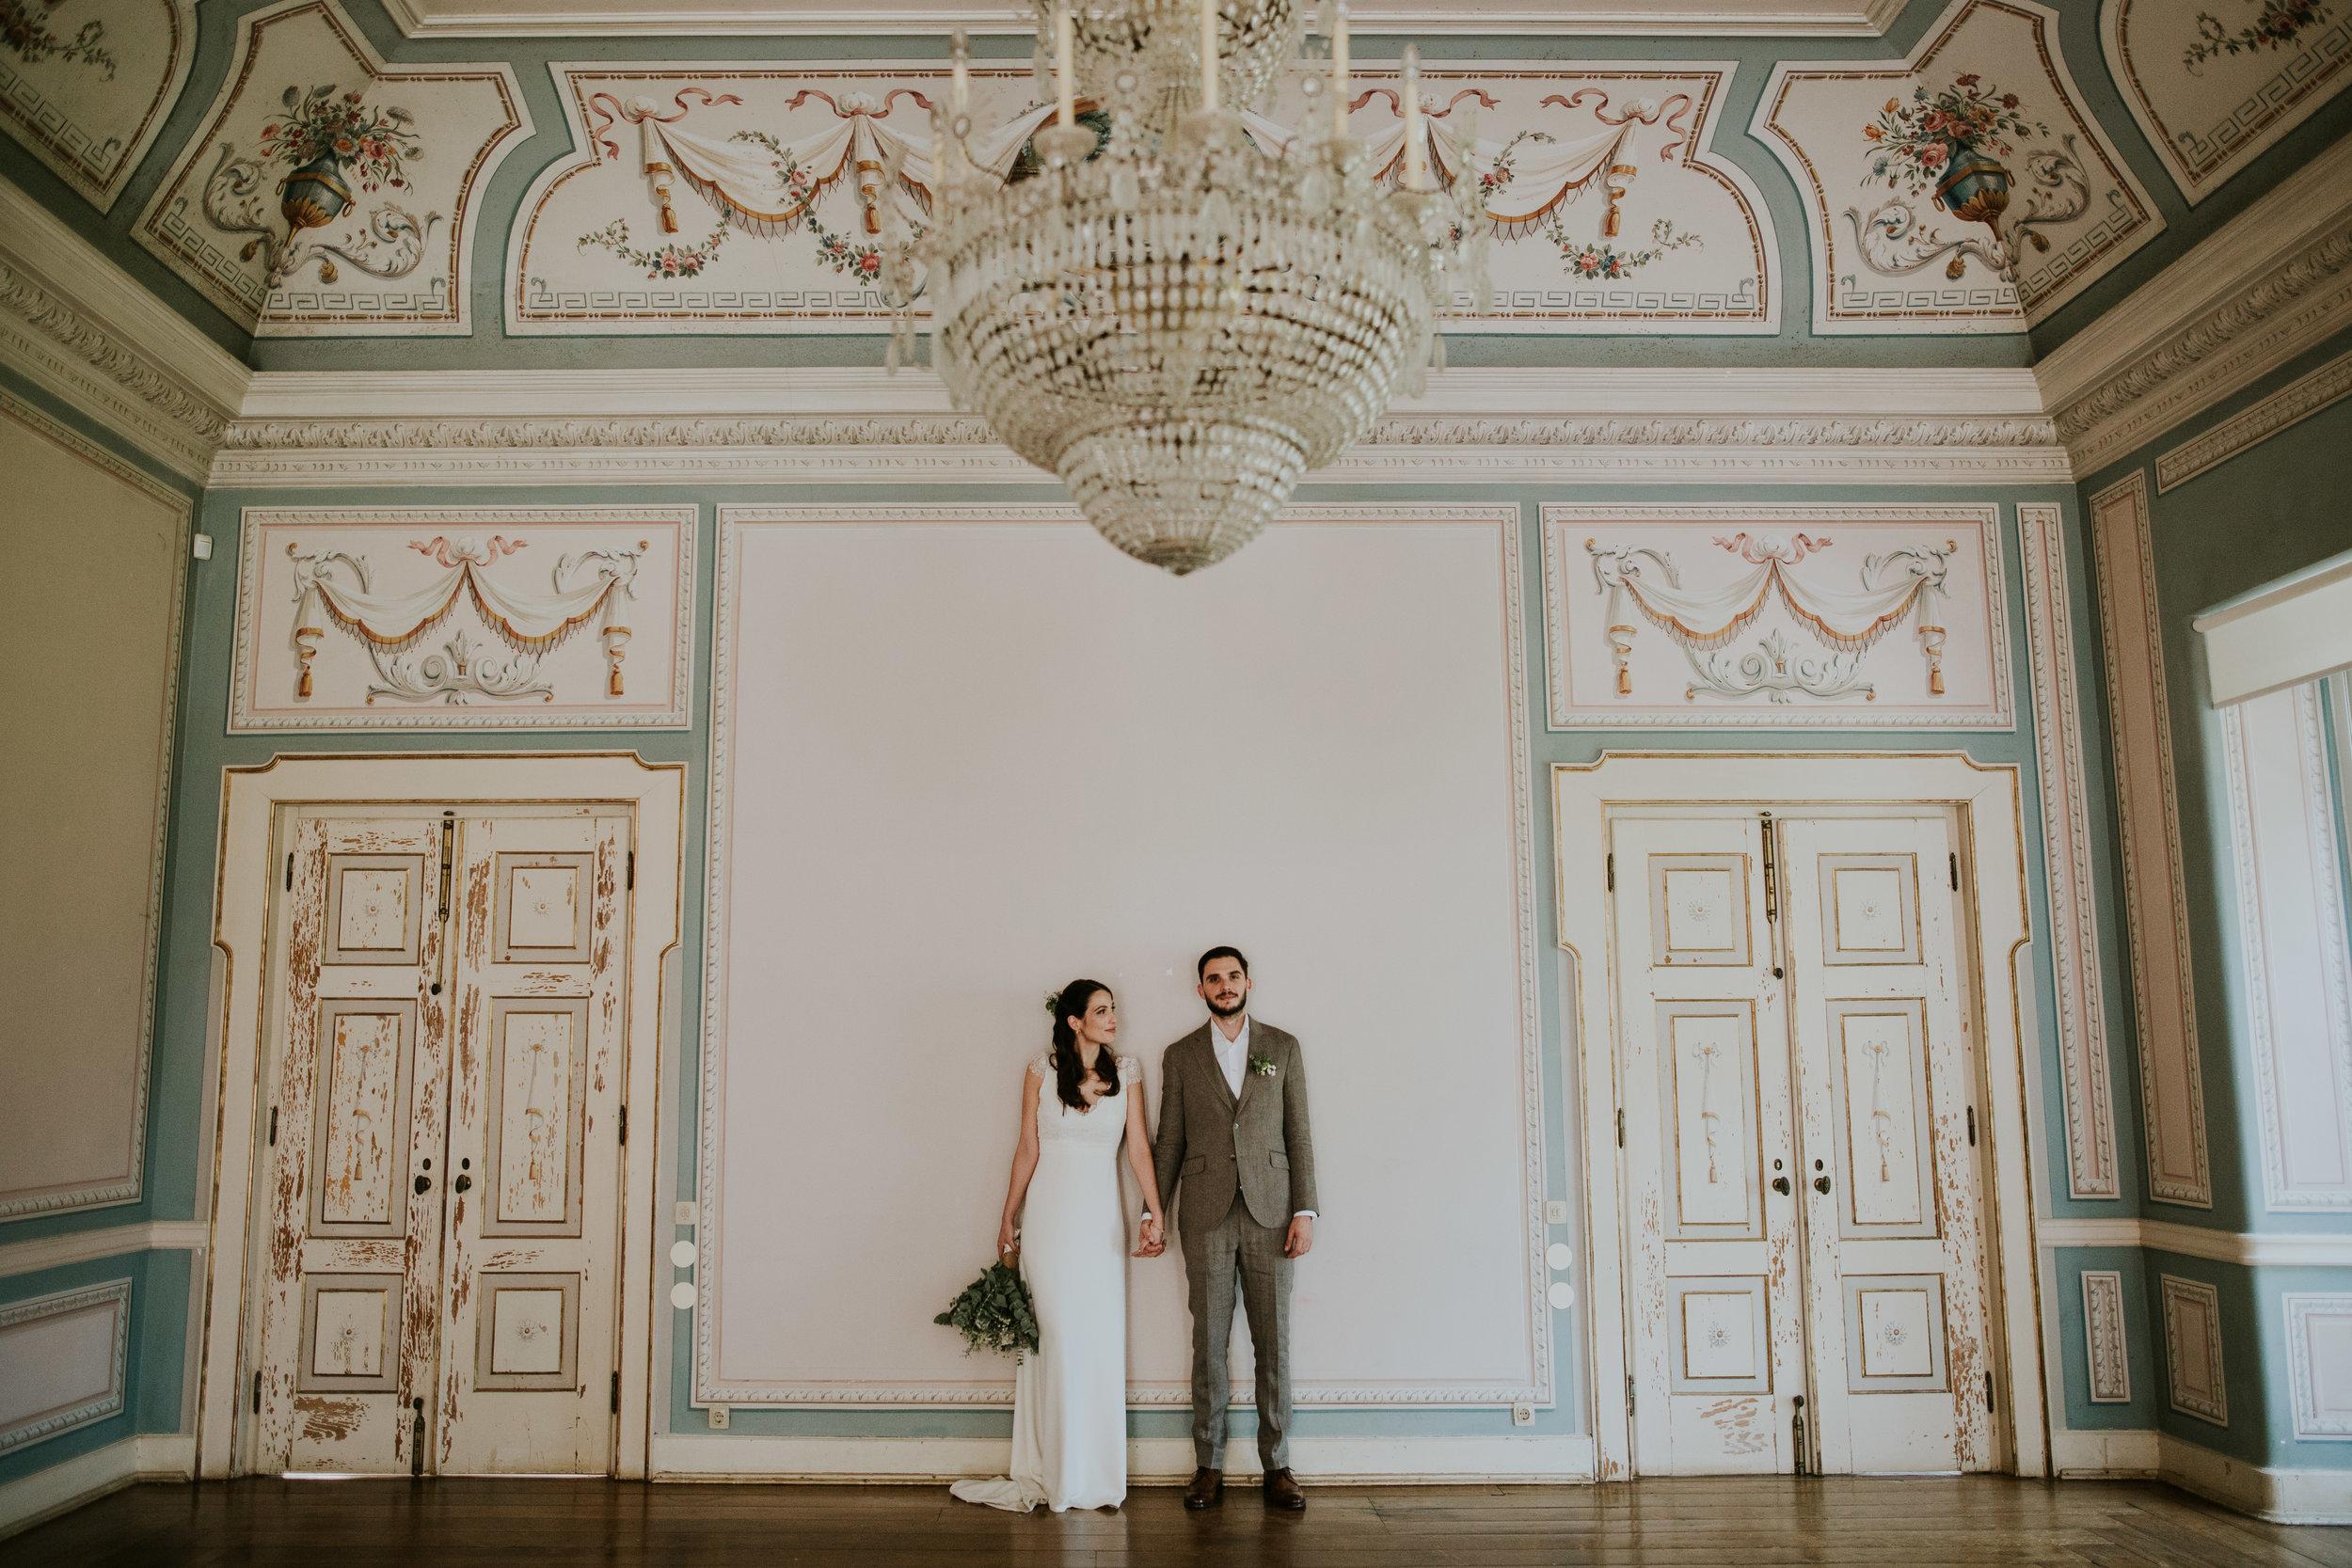 J&P 410_ 02 setembro 2017 Wedding day_.jpg